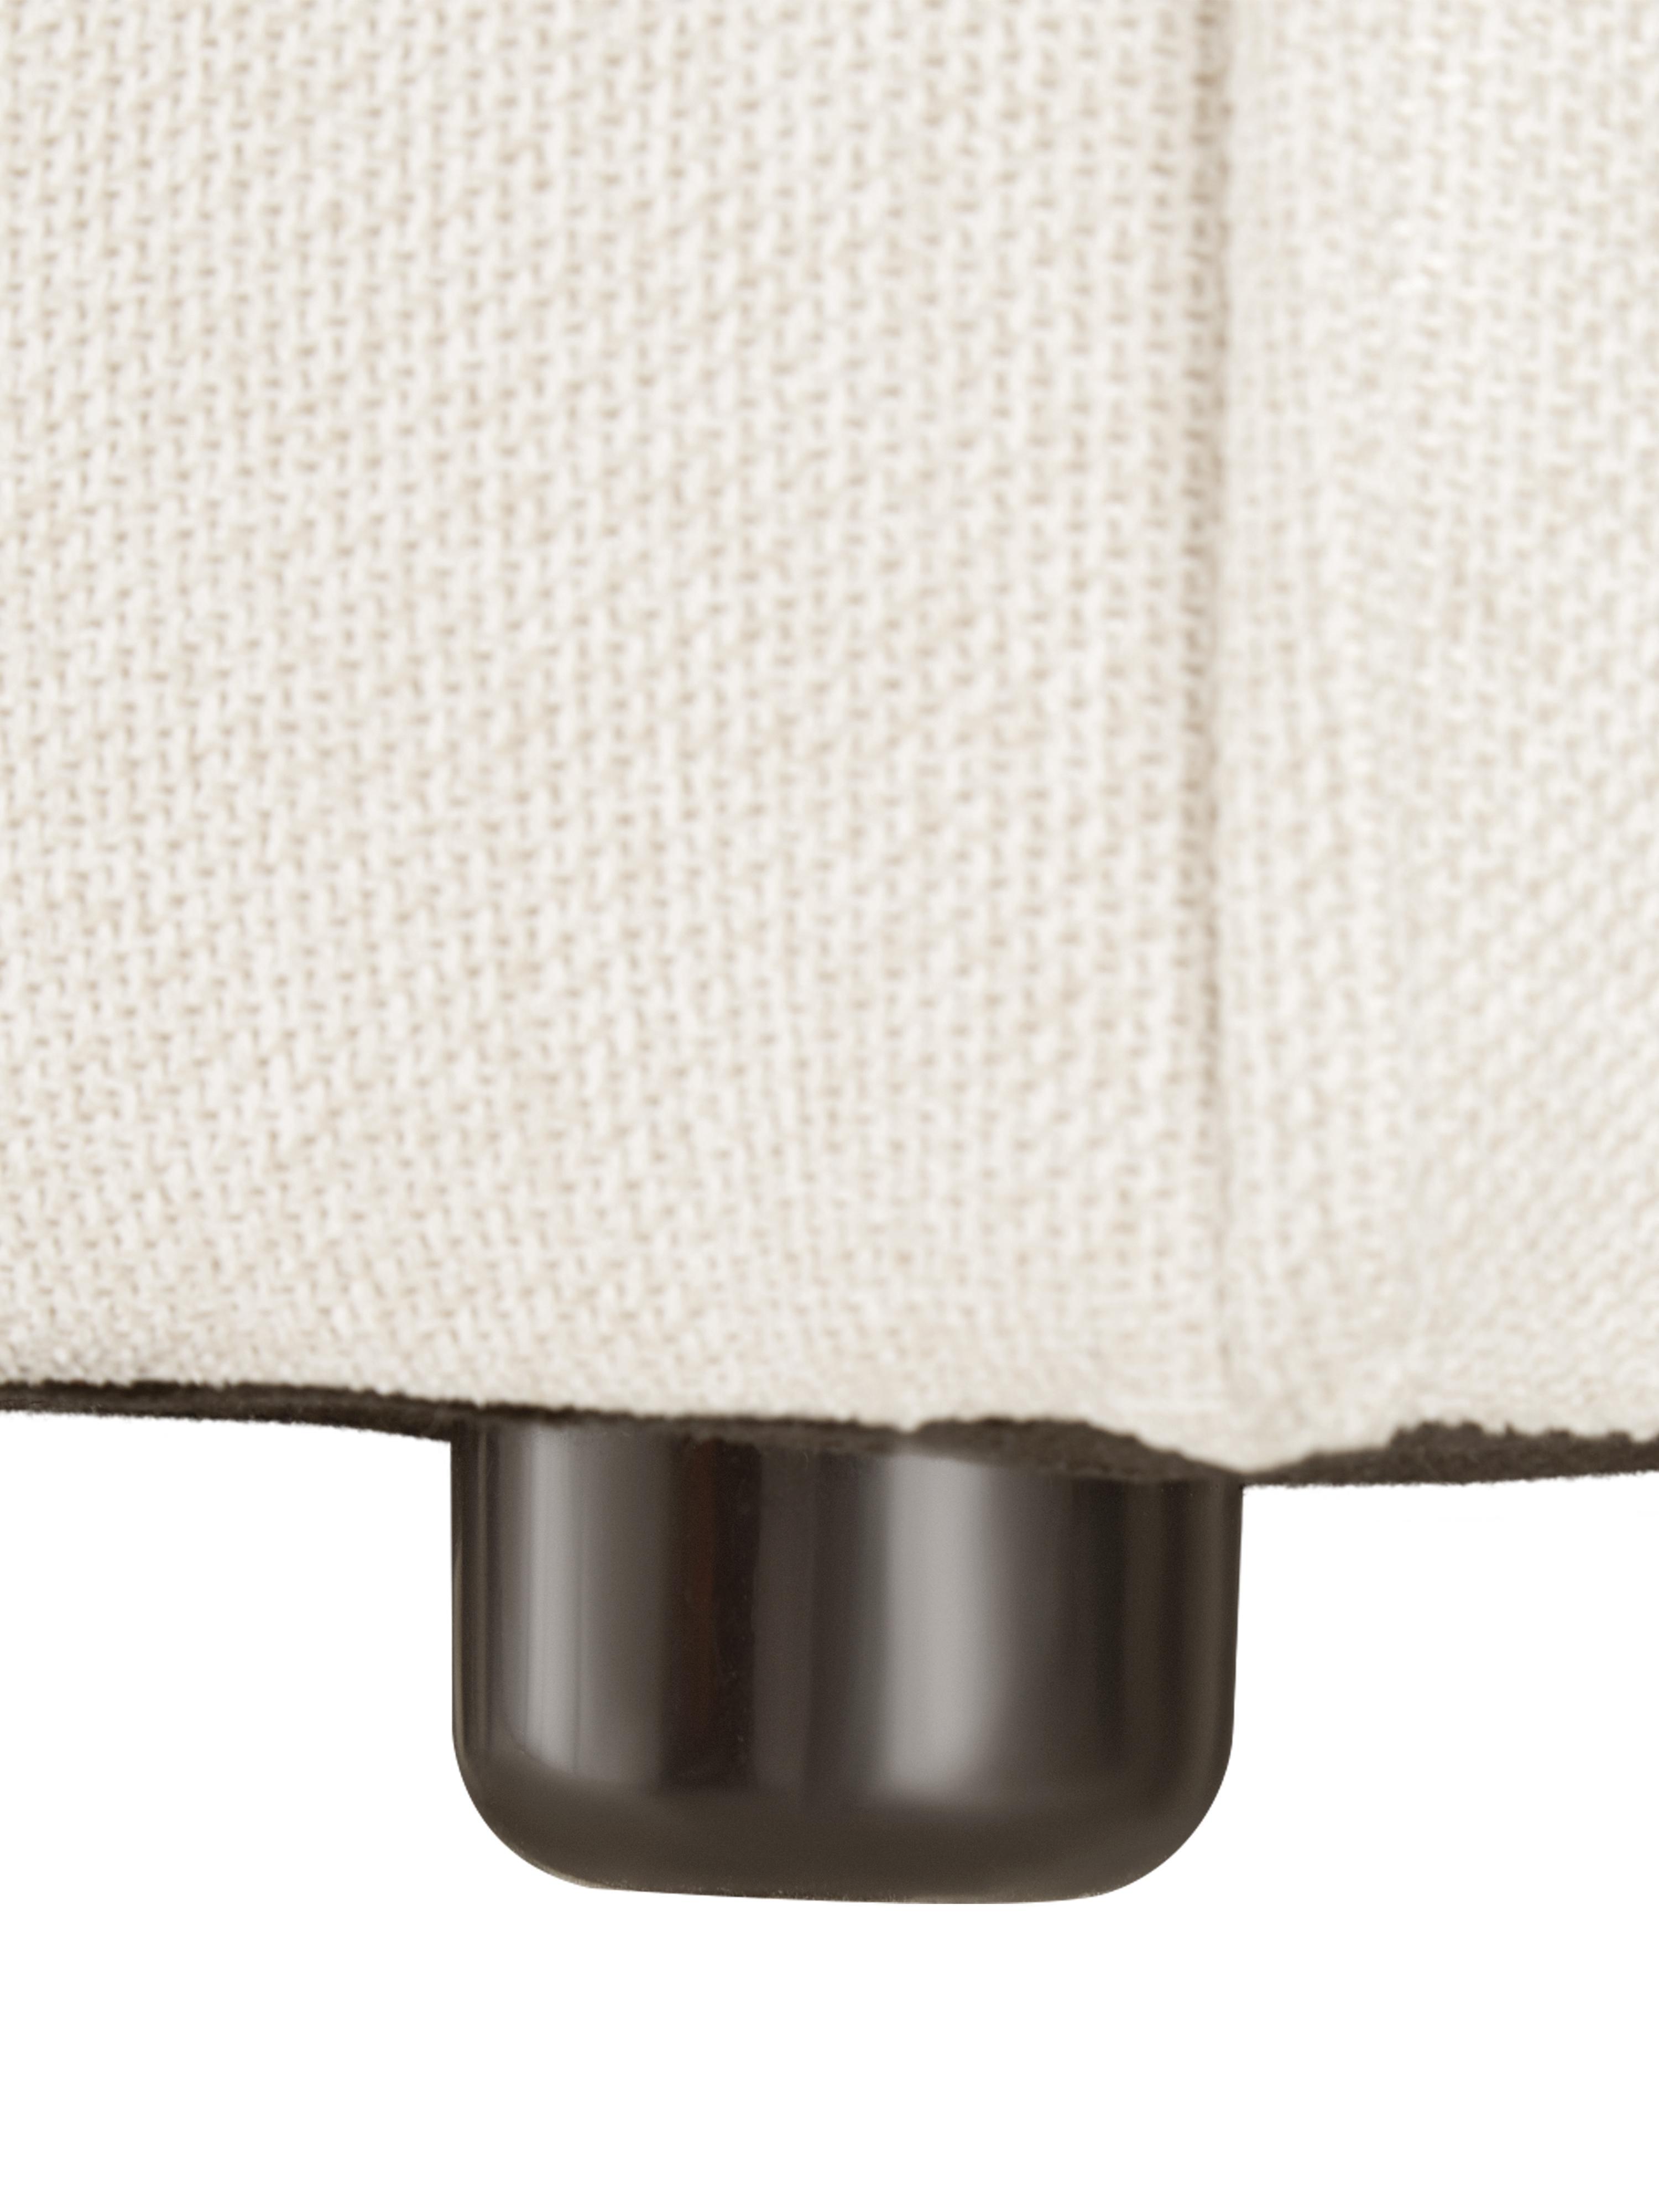 Modulares Sofa Lennon (4-Sitzer), Bezug: Polyester Der hochwertige, Gestell: Massives Kiefernholz, Spe, Füße: Kunststoff, Webstoff Beige, B 326 x T 119 cm